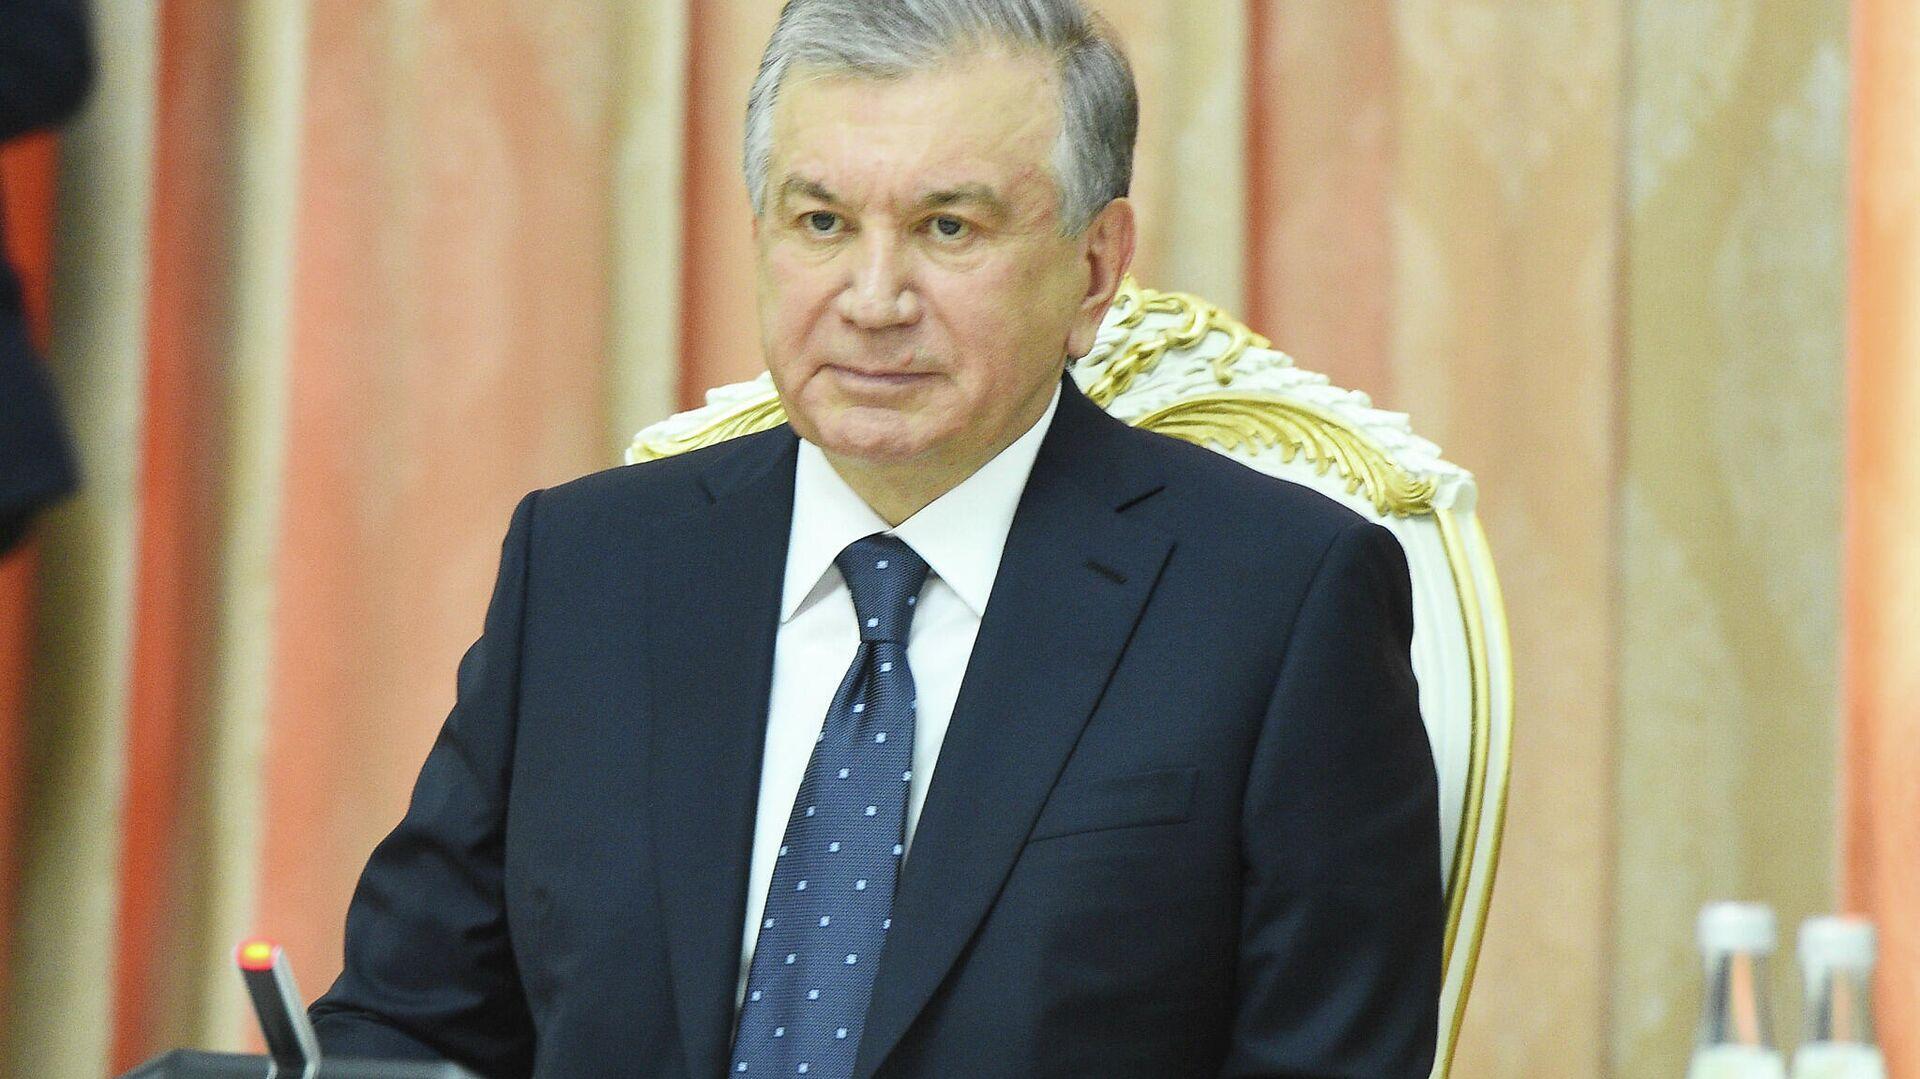 Президент Узбекистана Шавкат Мирзиеев  - Sputnik Таджикистан, 1920, 17.09.2021